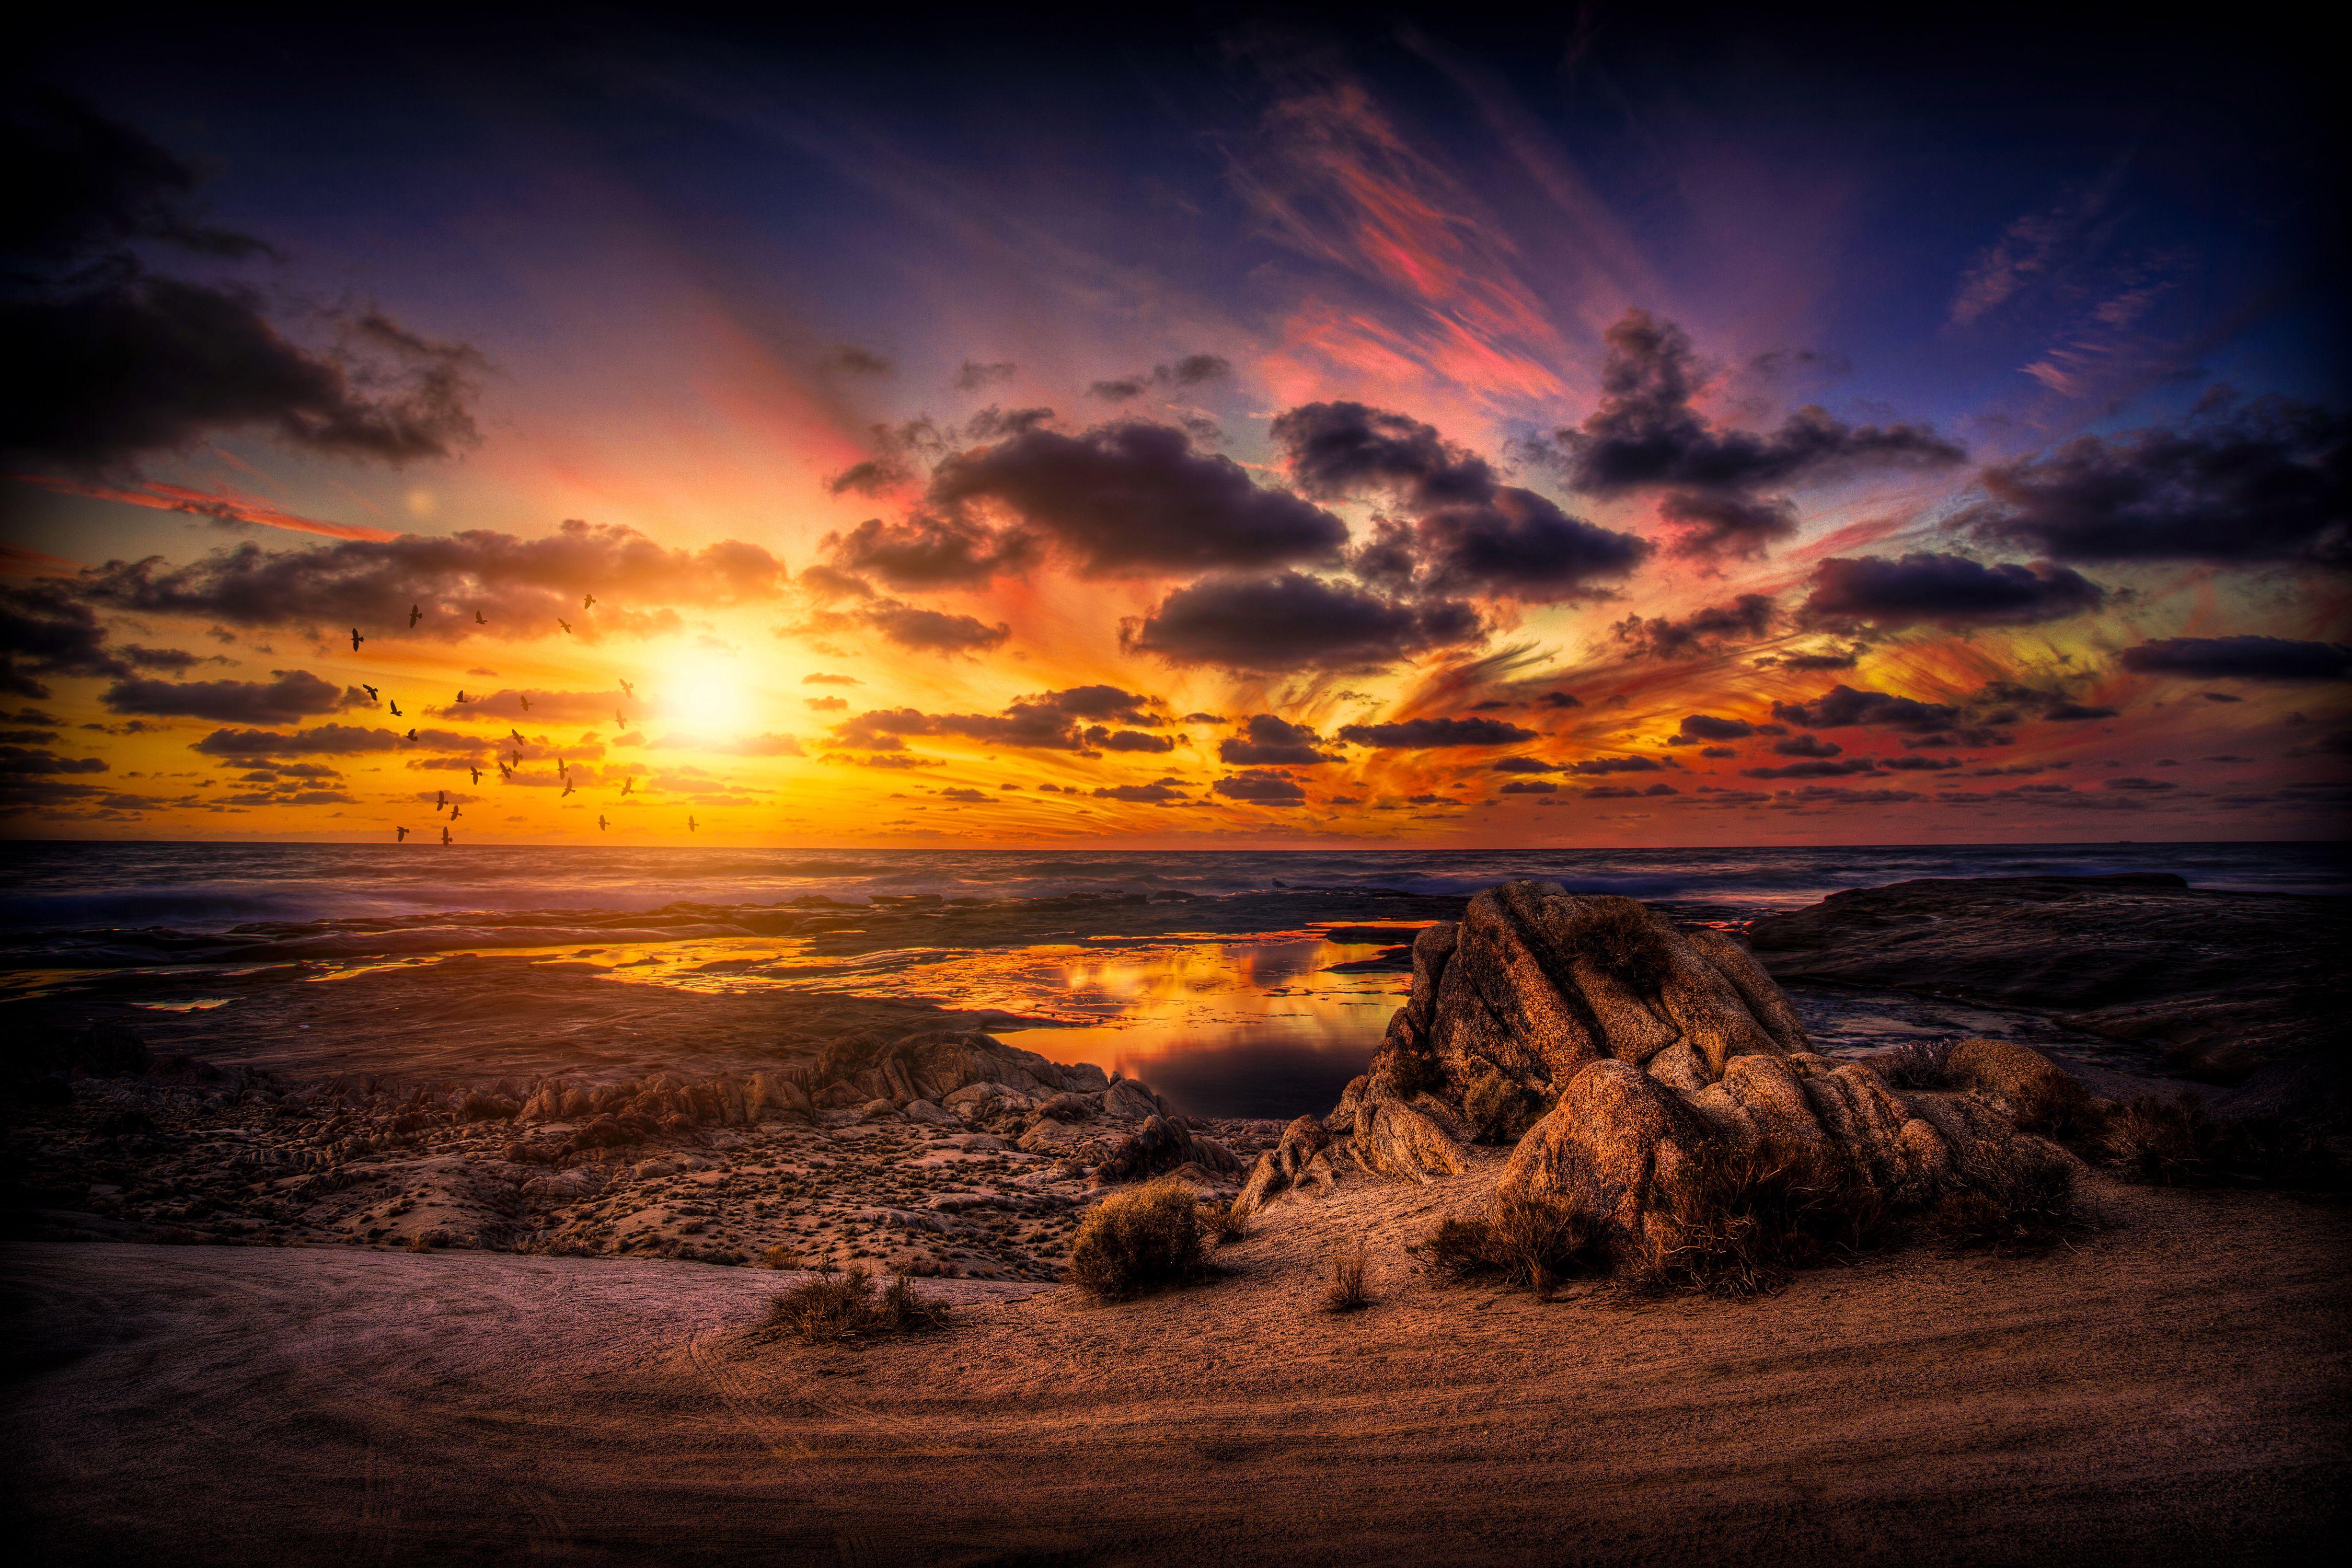 Beautiful sunset 😎 sunset vacation travel cooldown